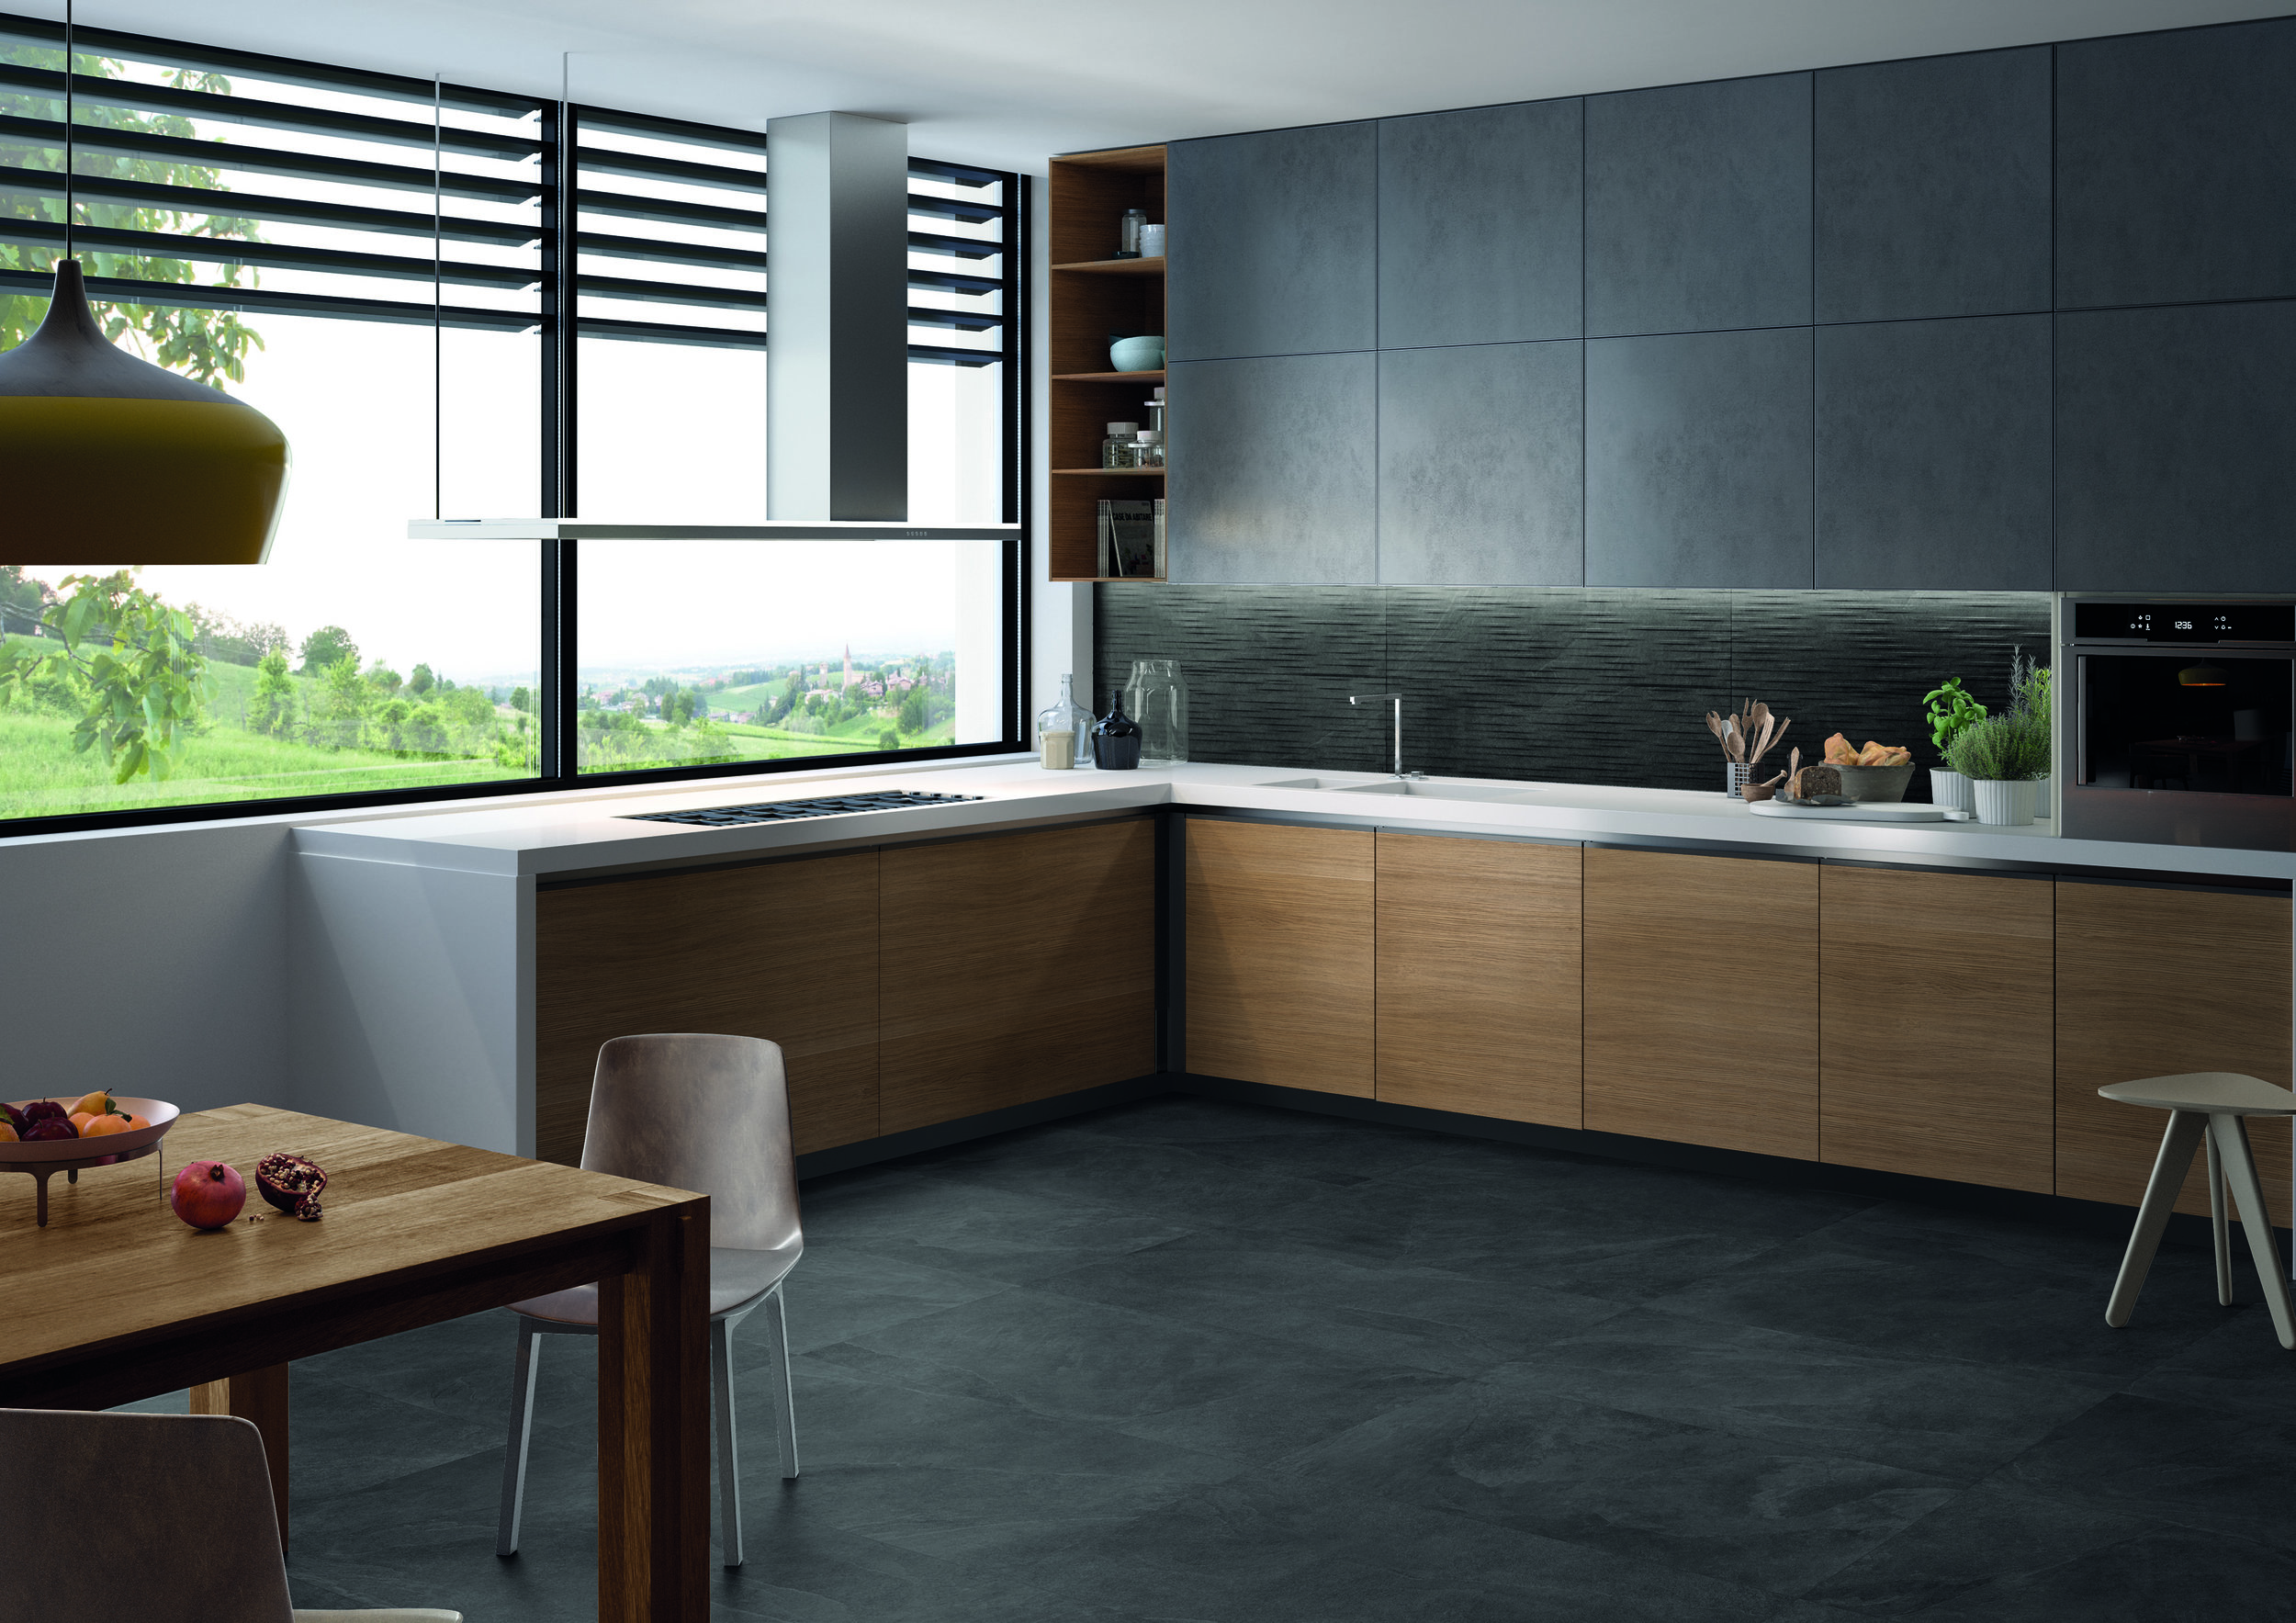 Cornerstone Slate Black 60x120-Parallelo Amb Cucina.jpg